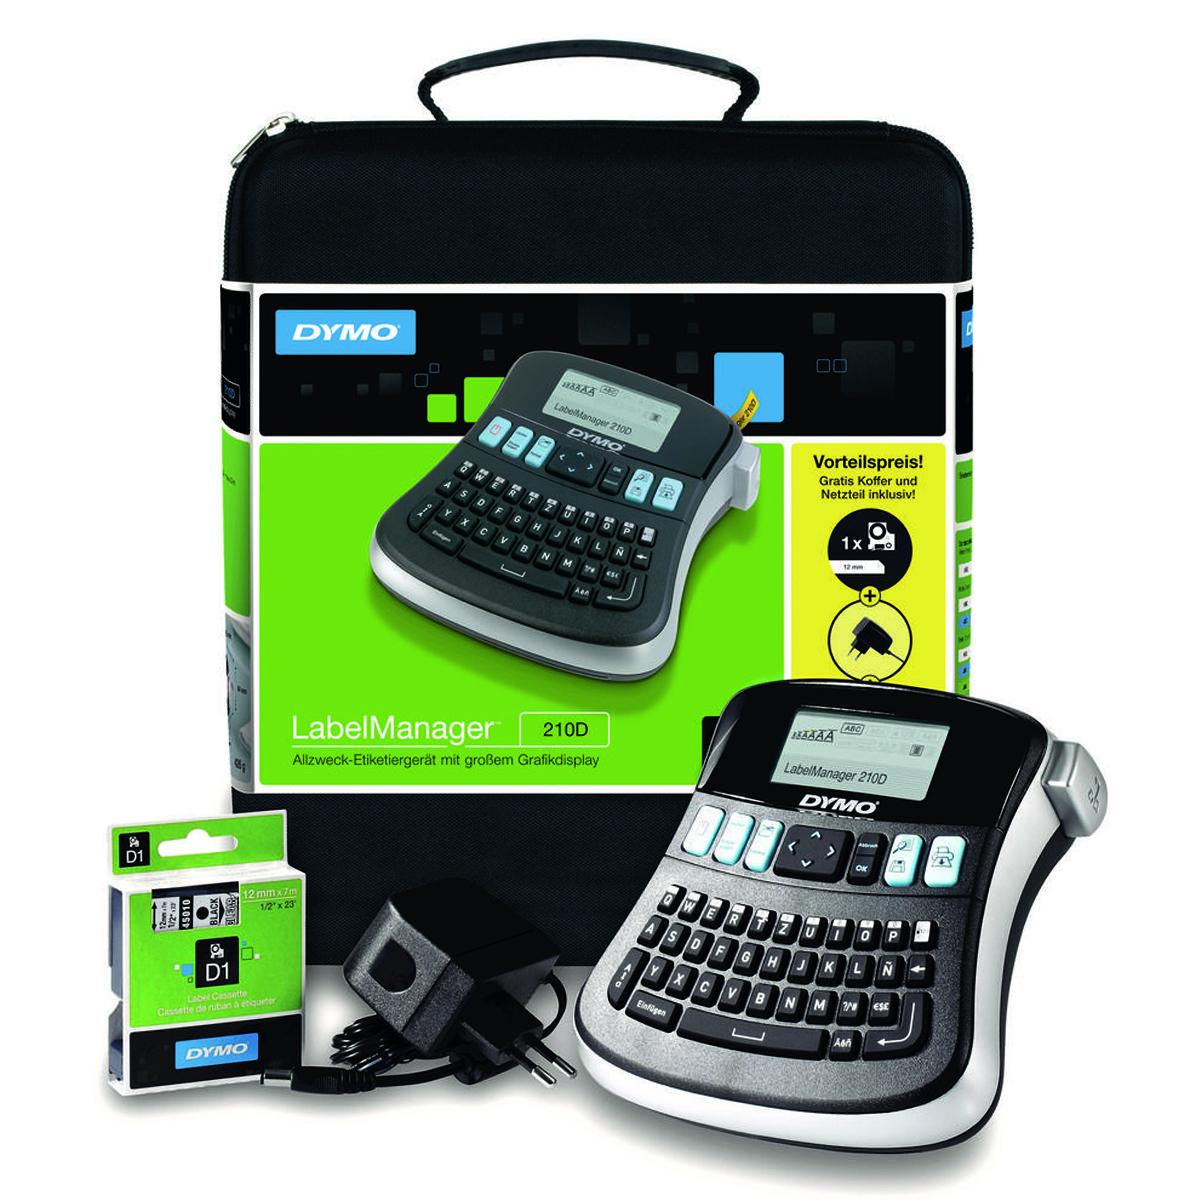 Dymo - LabelManager 210D QWERTY - Labelprinter